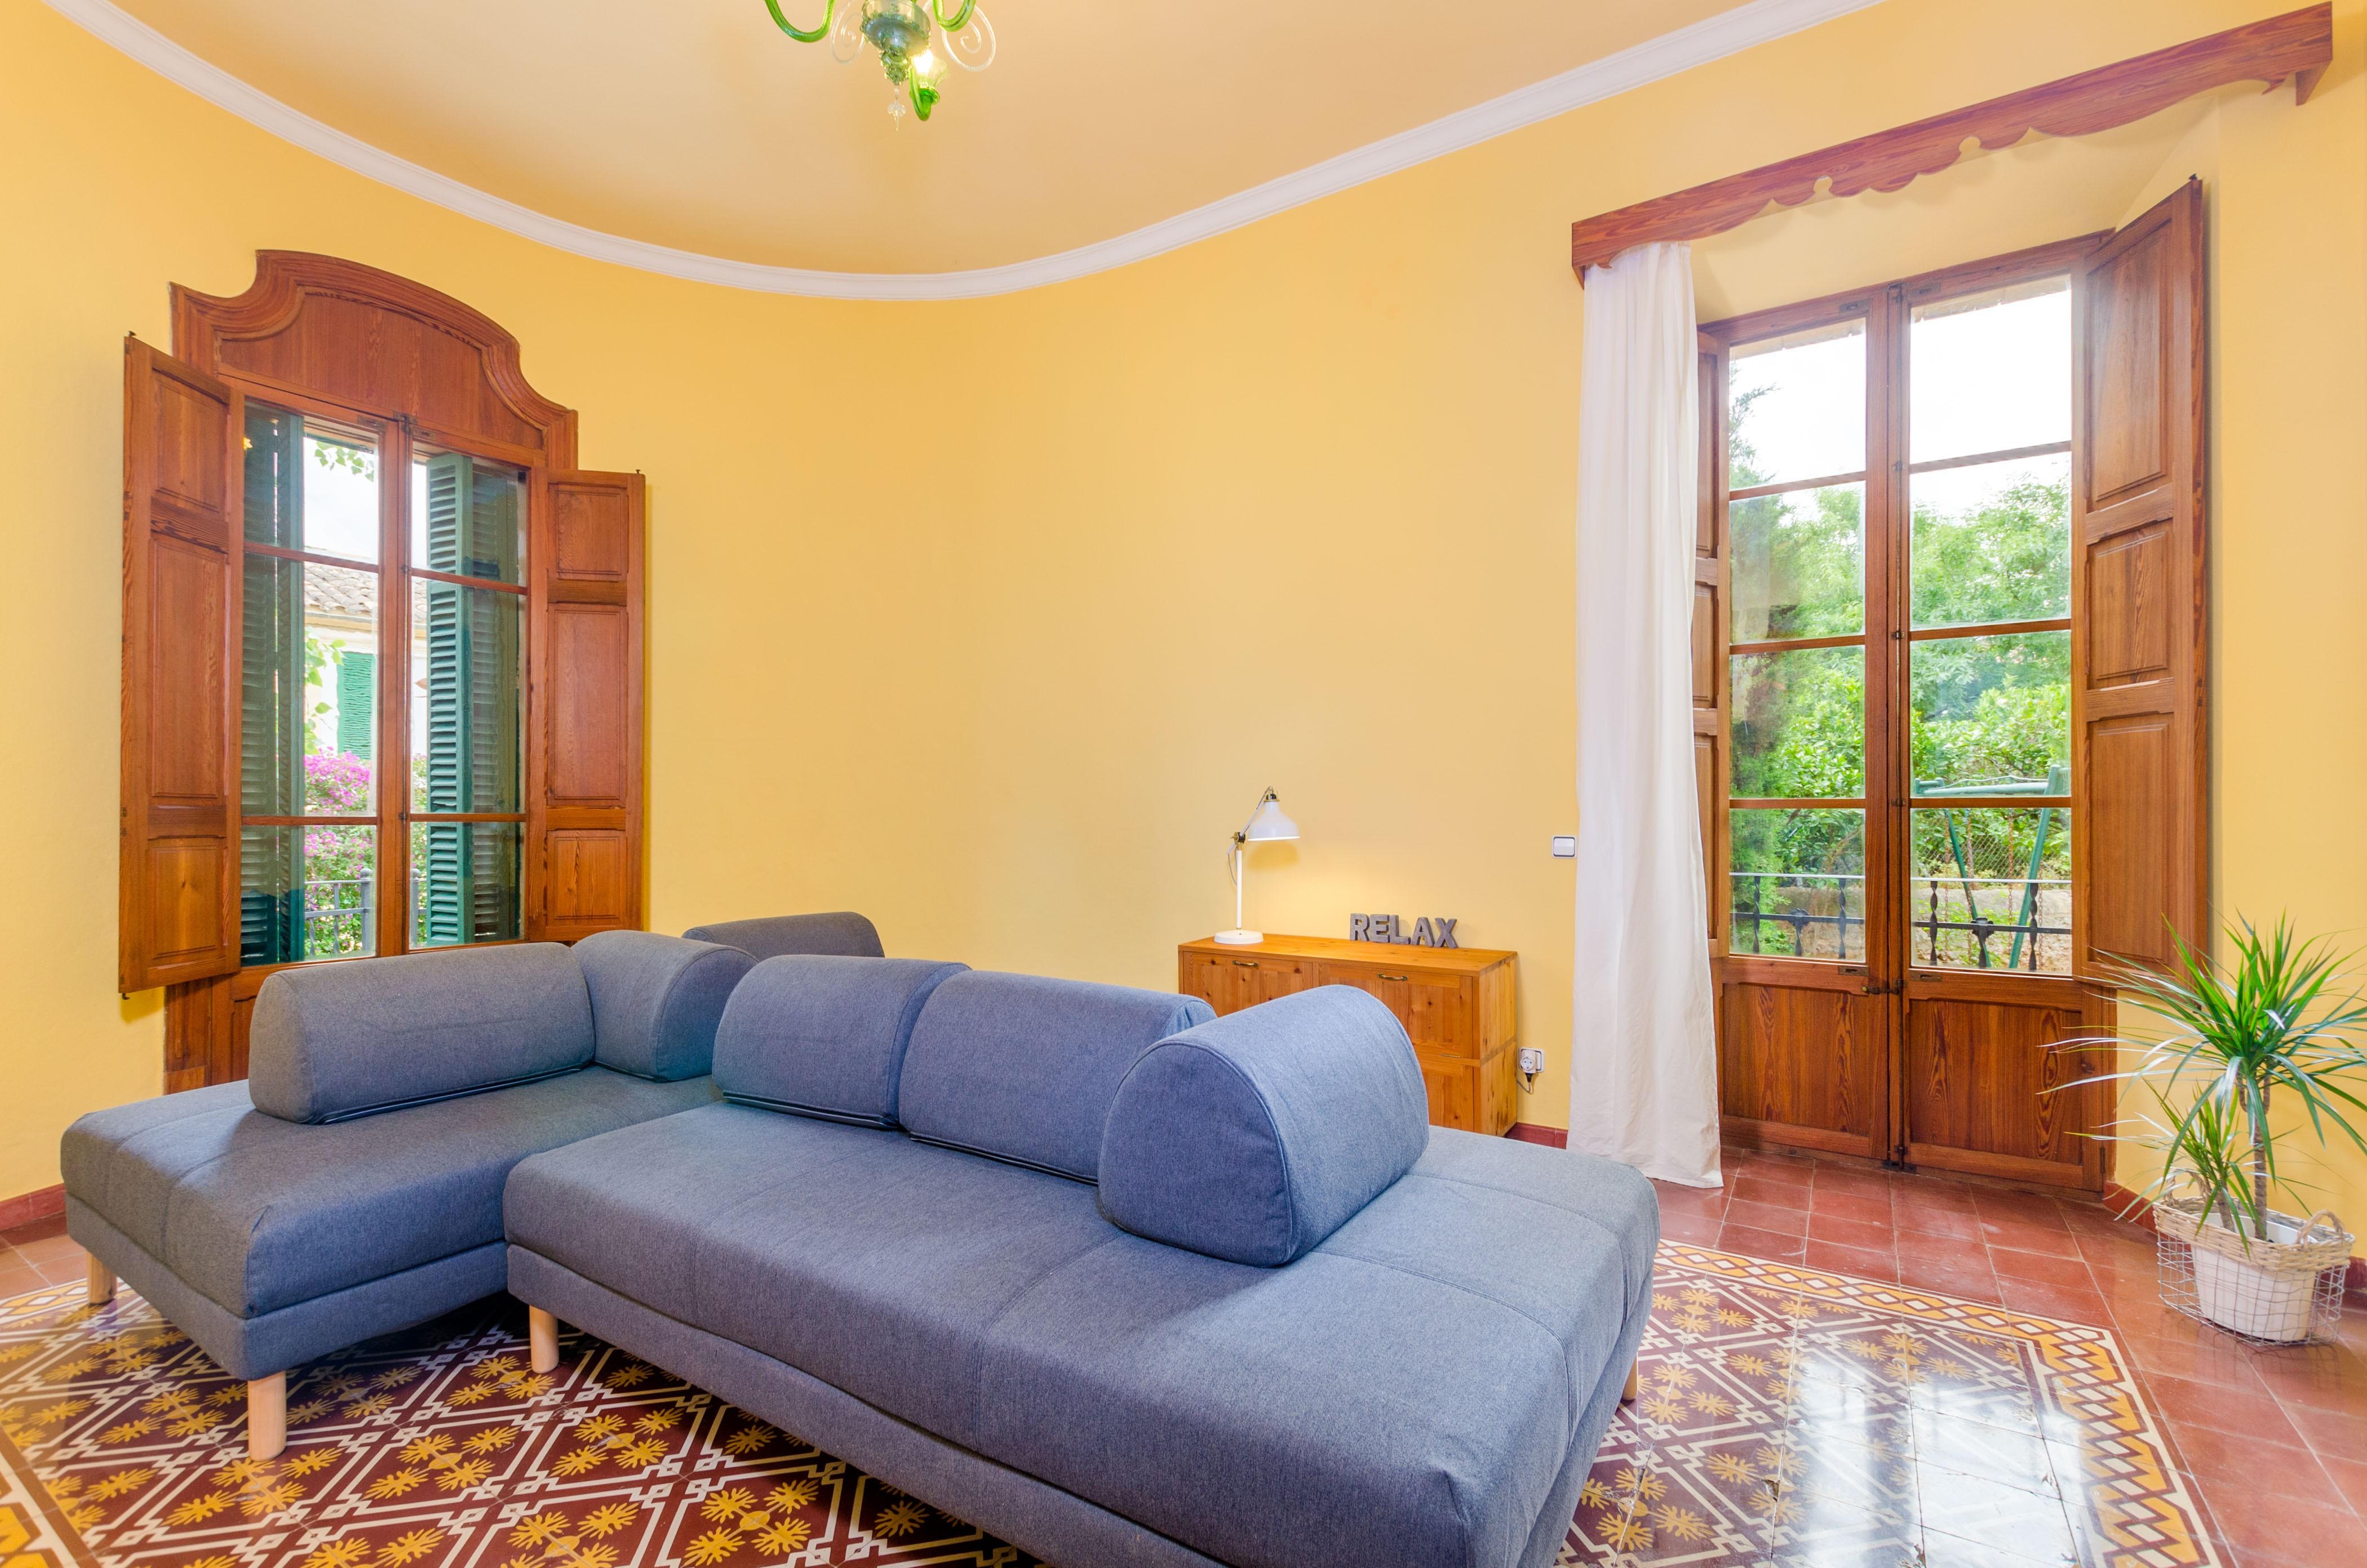 Maison de vacances CAS CONVIDATS (2435013), Alaro, Majorque, Iles Baléares, Espagne, image 23